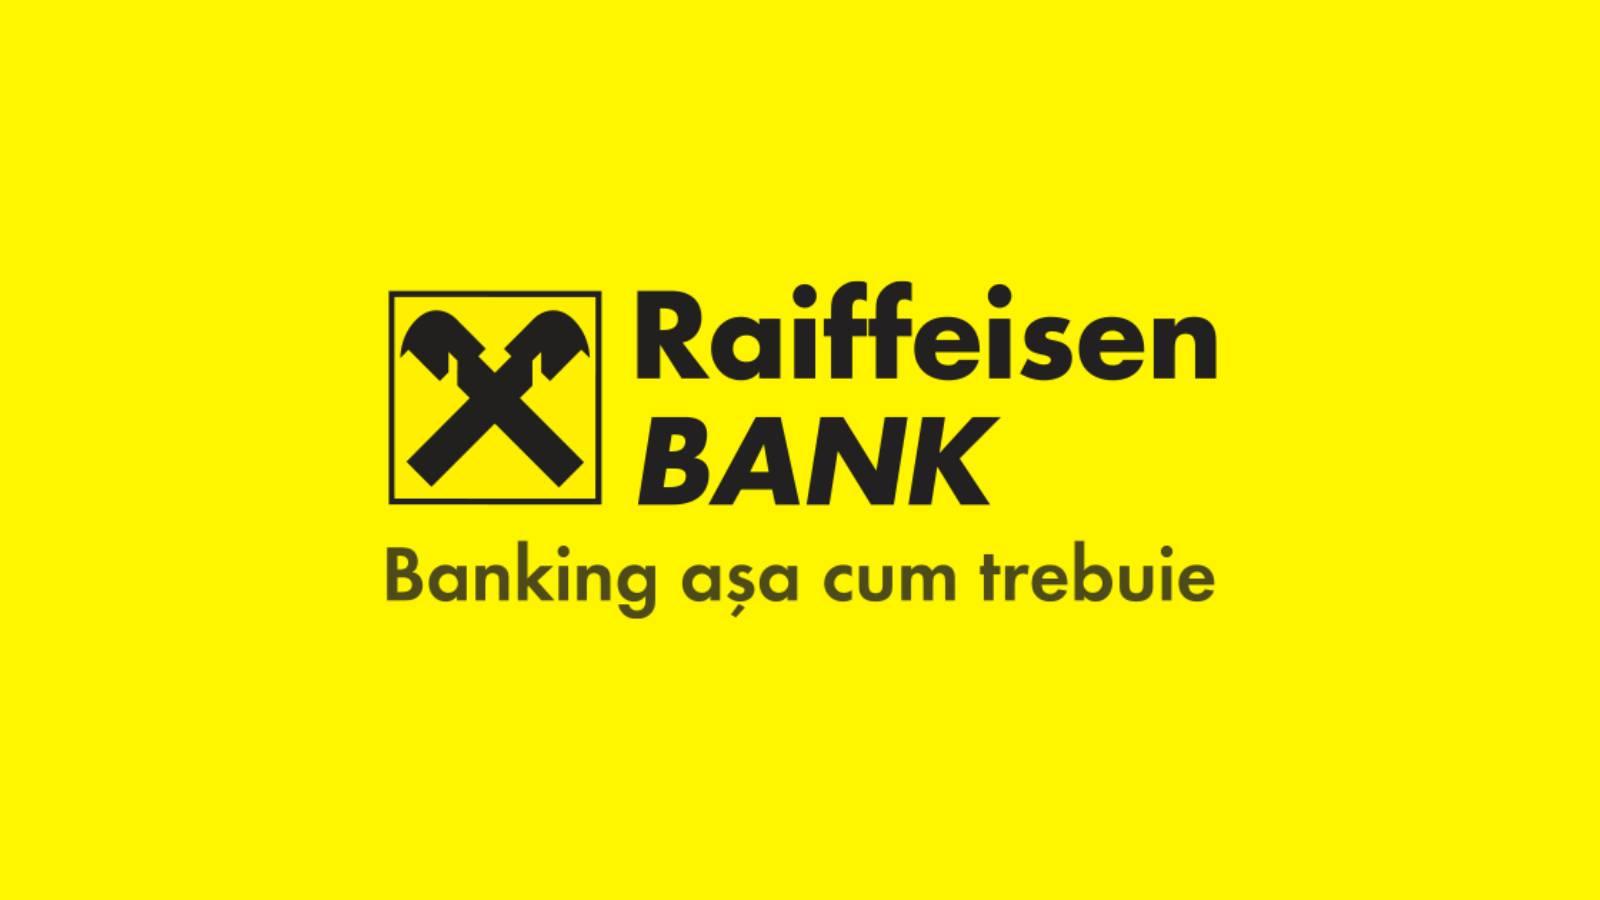 Raiffeisen Bank alerta